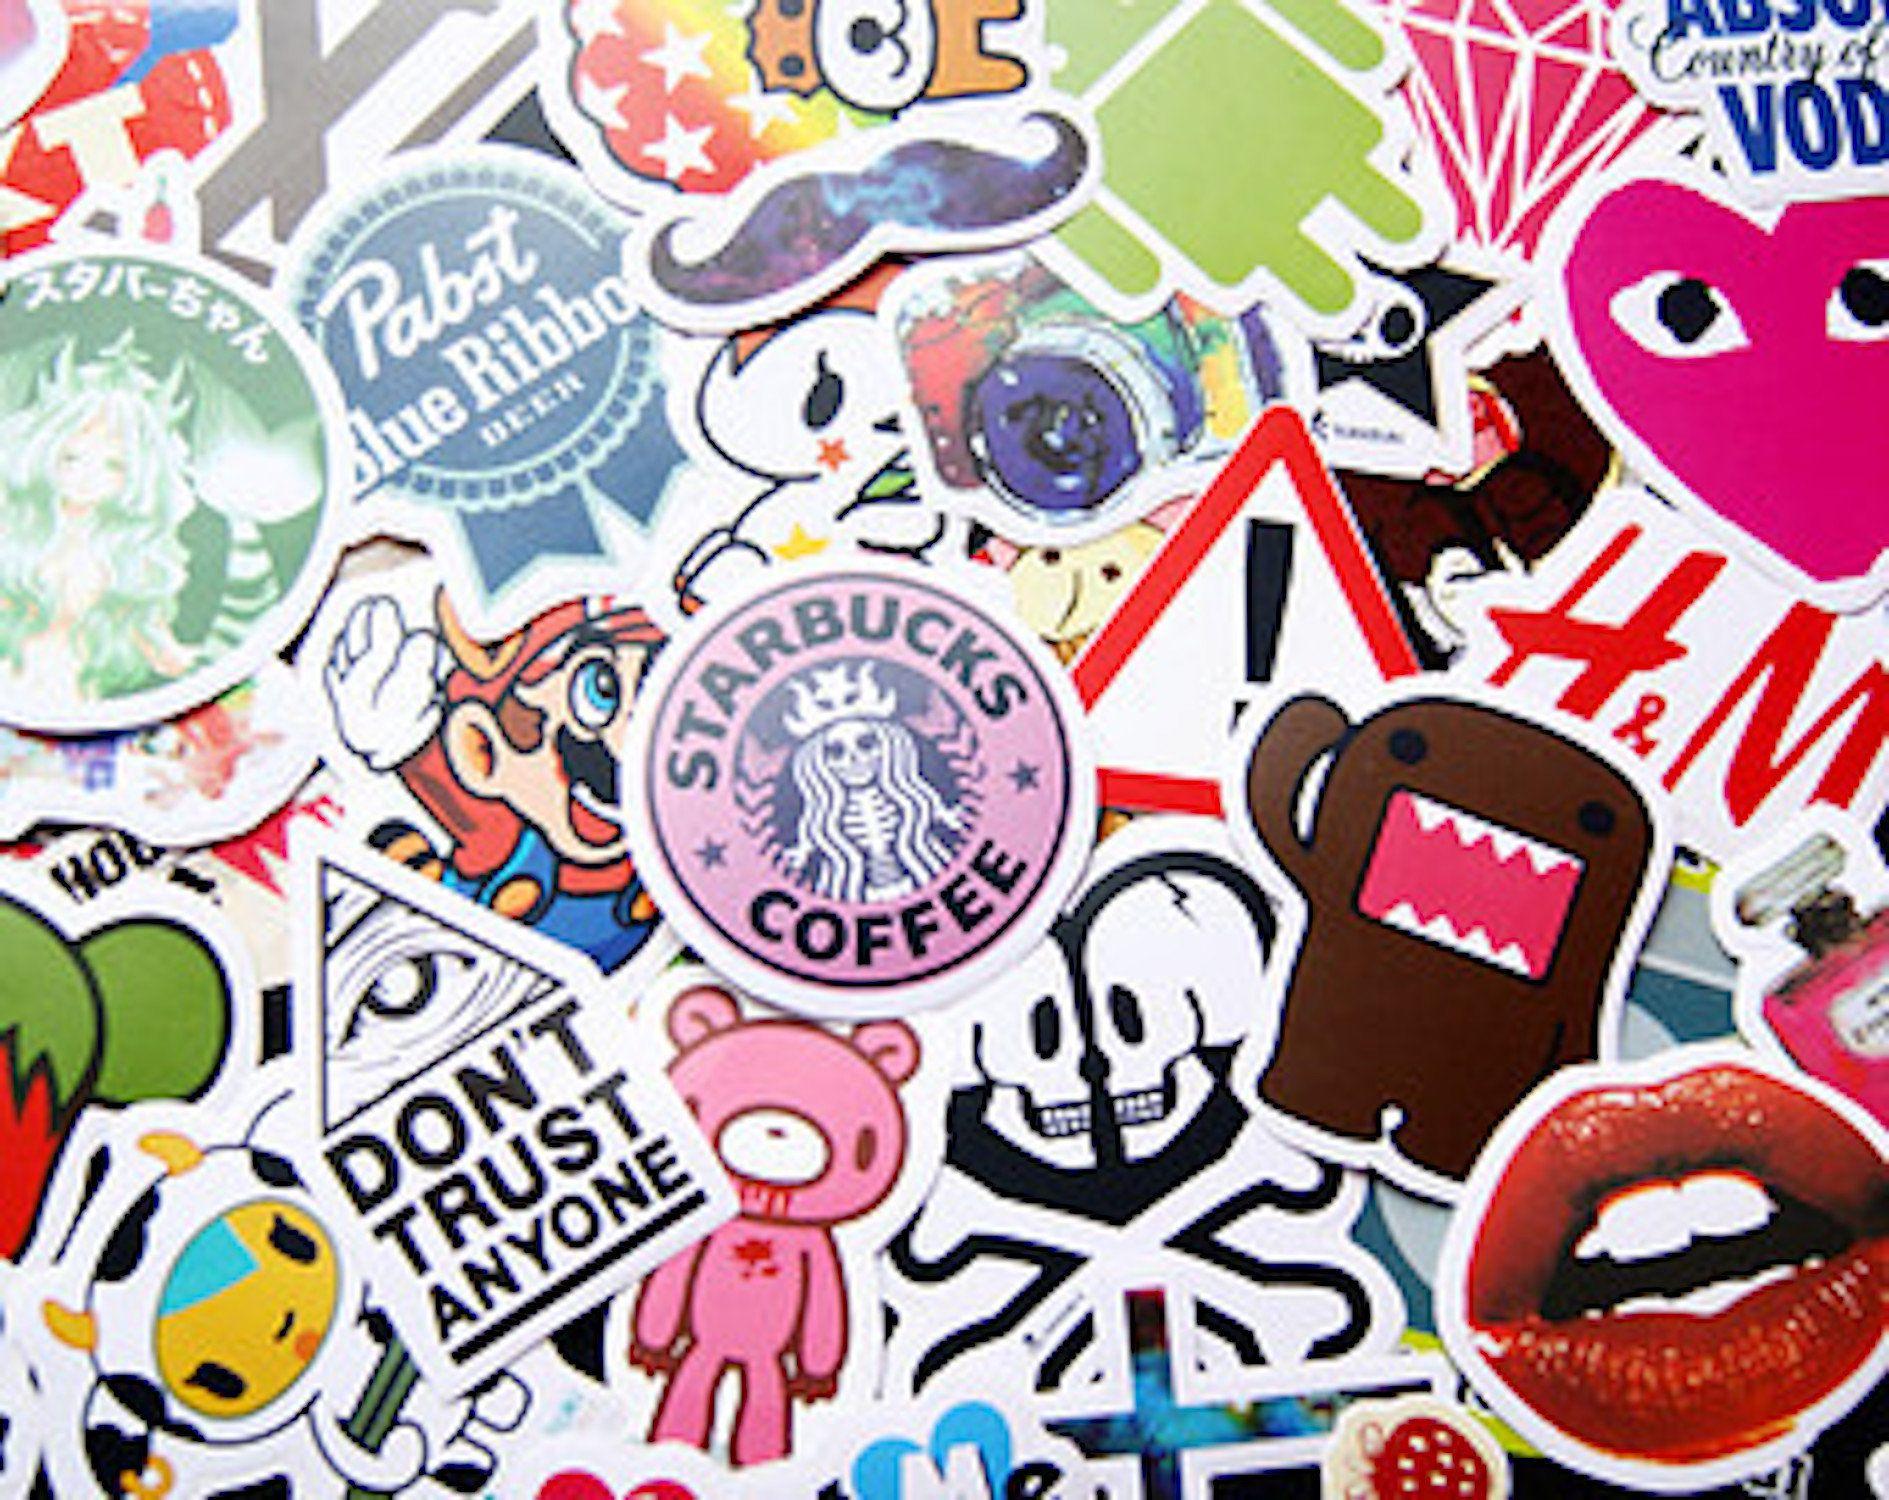 Show Me Your Universe Art Sticker Bubble-Free Sticker